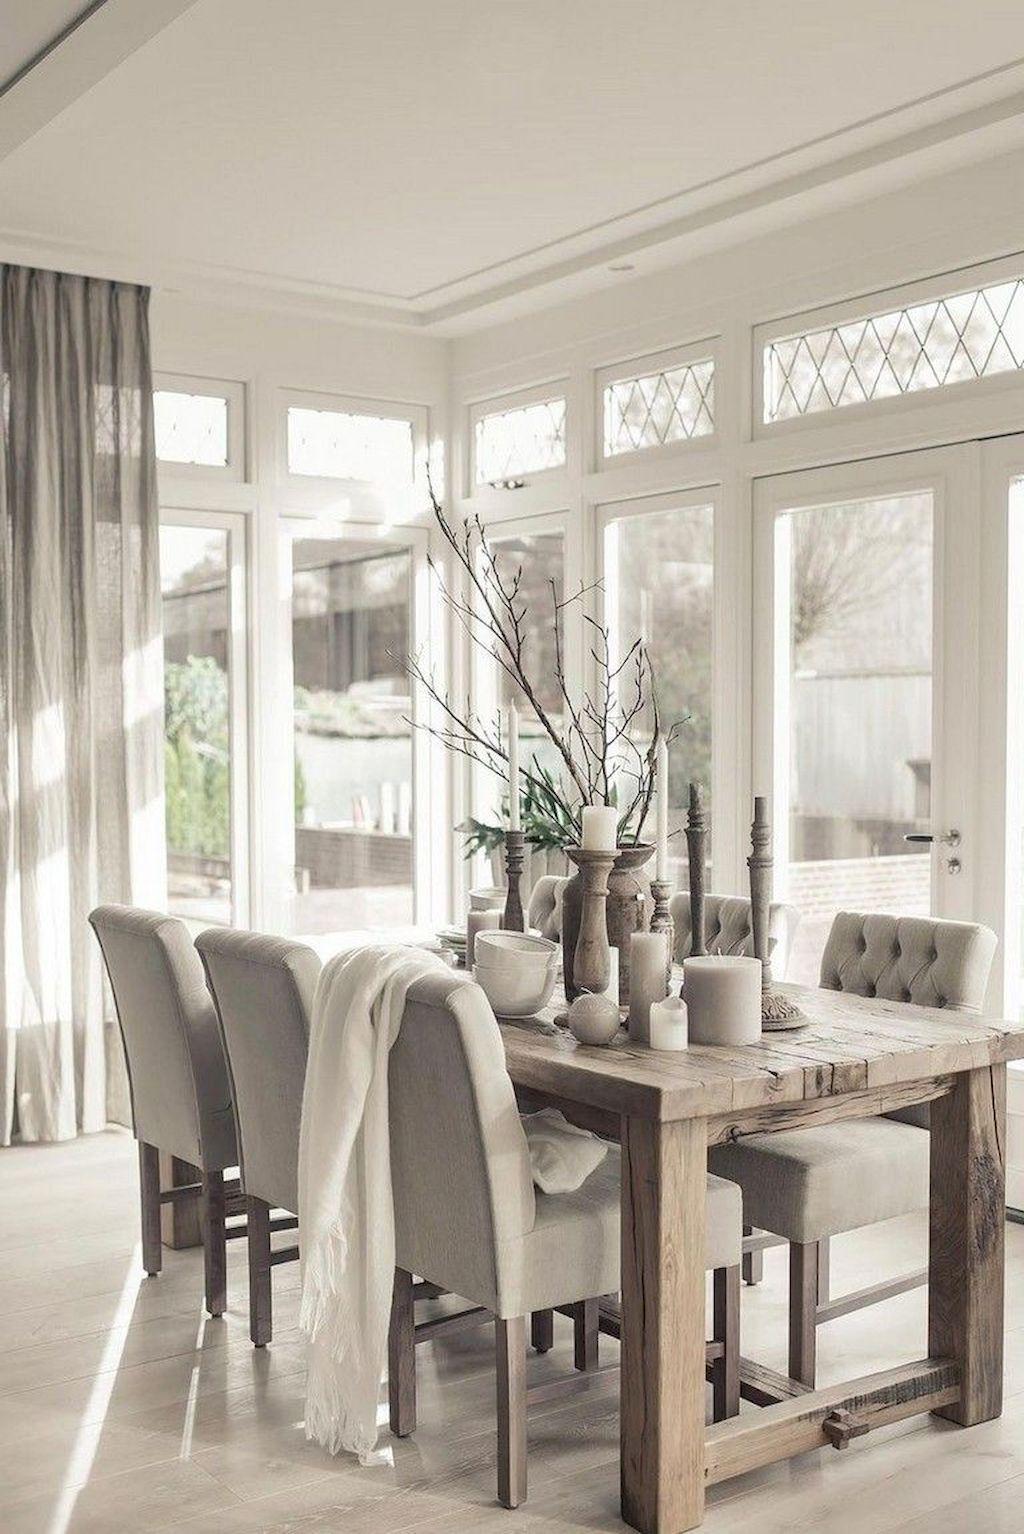 75 Modern Farmhouse Dining Room Decor Ideas – HomeSpecially